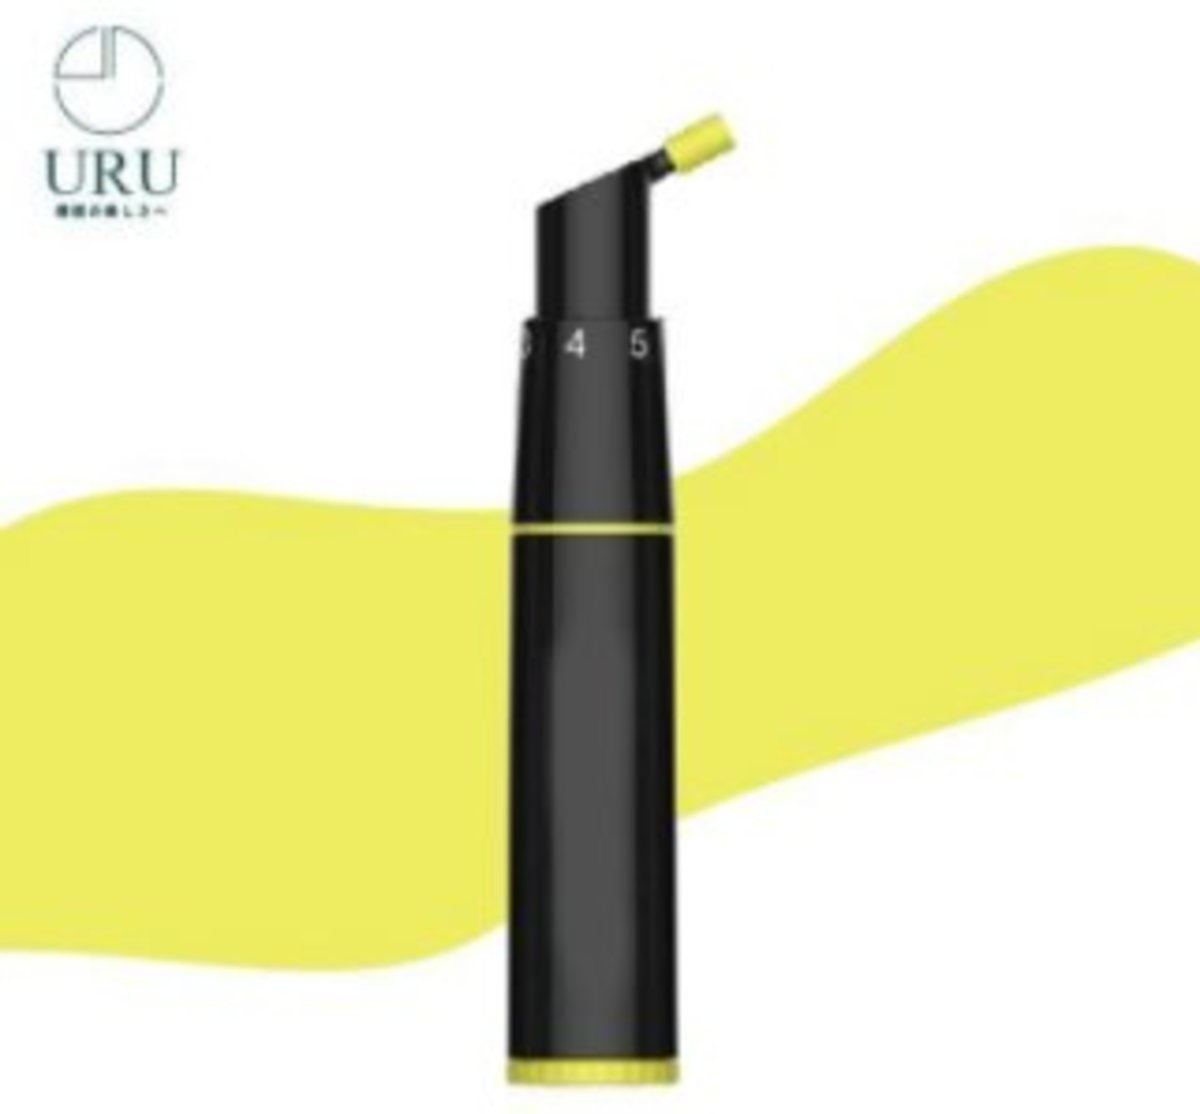 URU Color Mixing pen - yellow